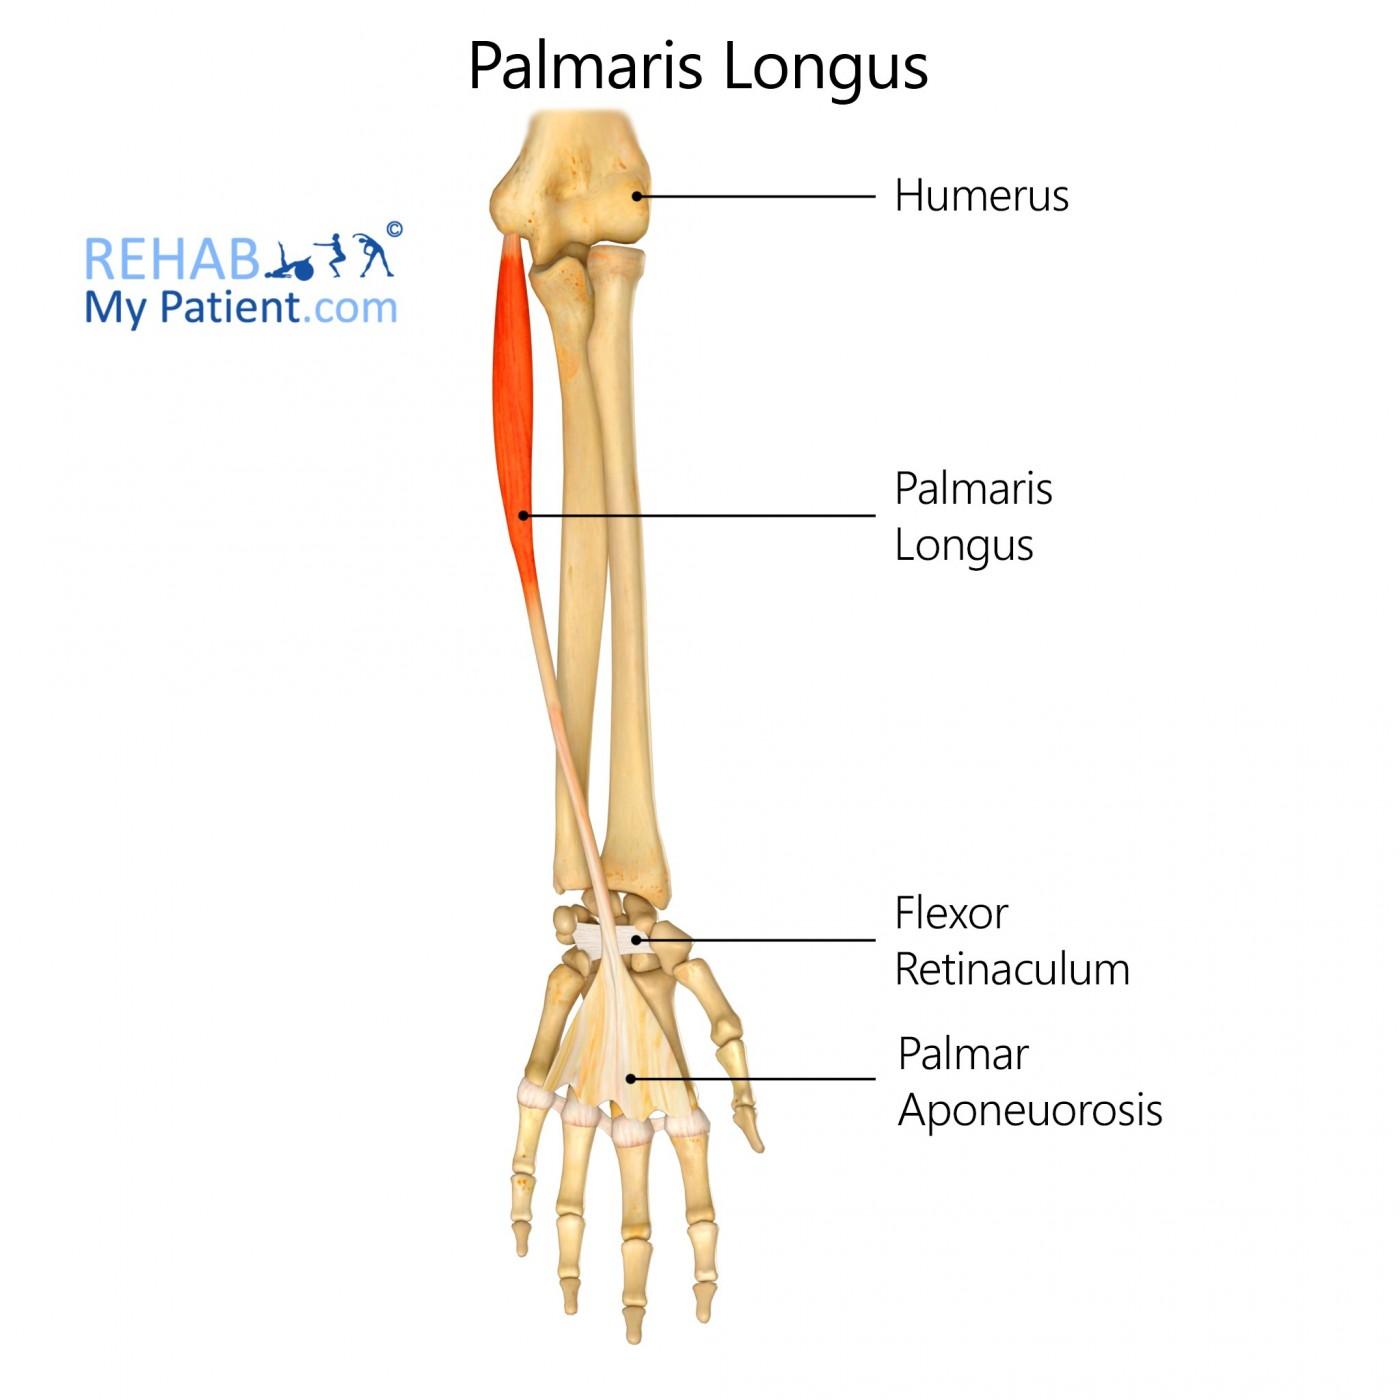 Palmaris Longus